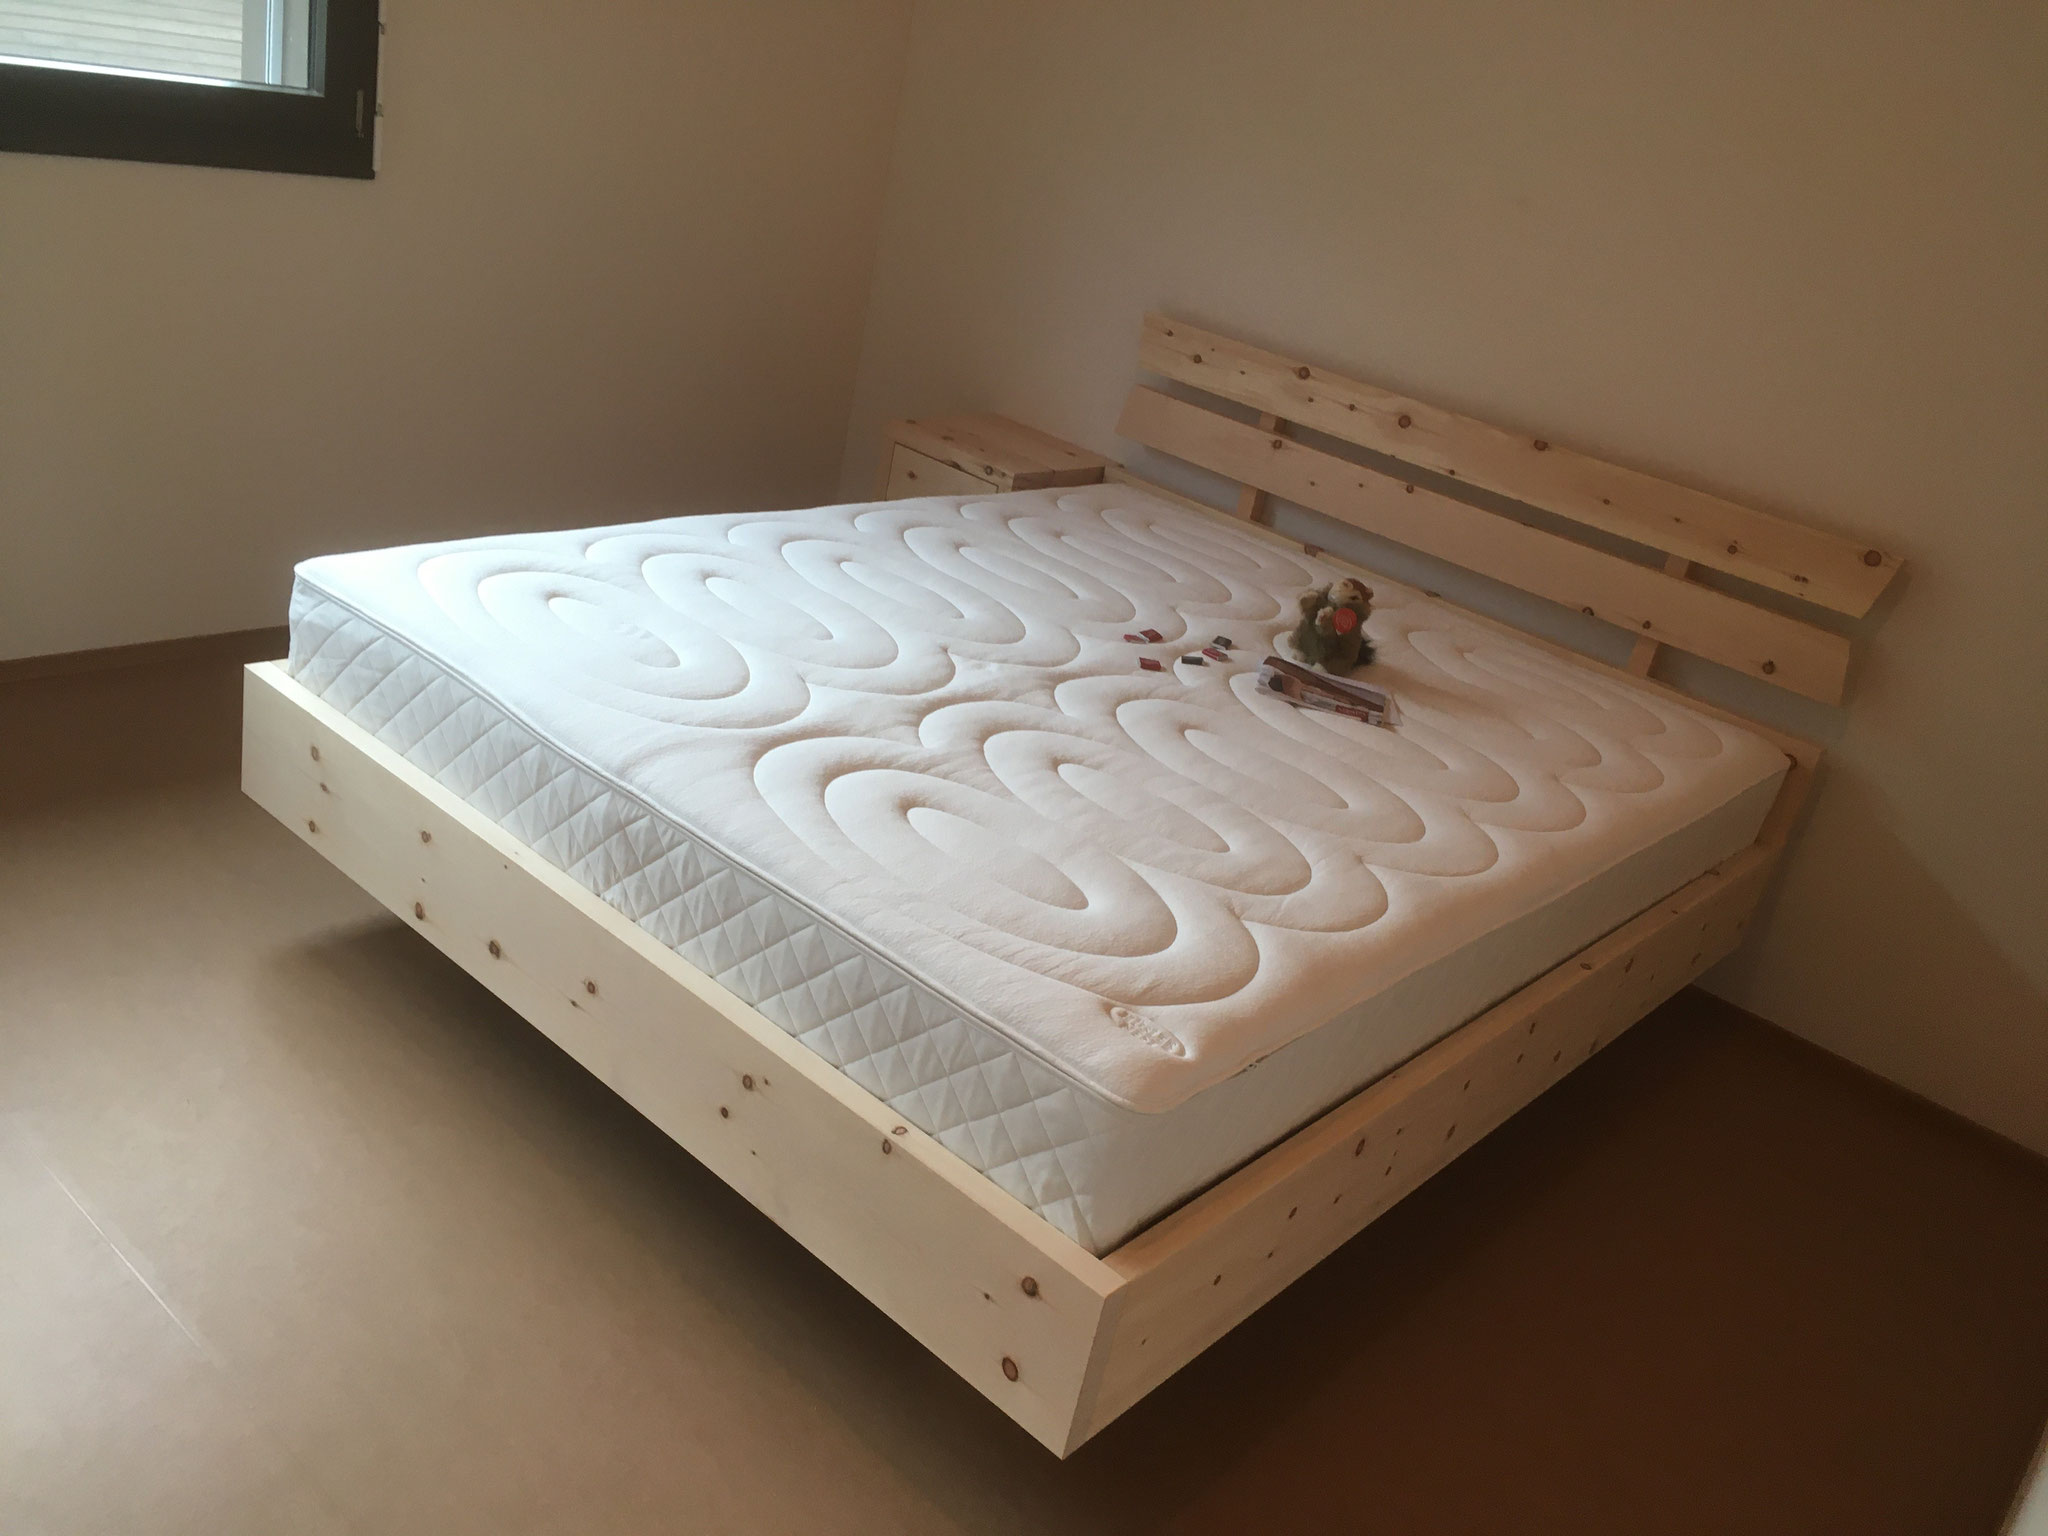 Arvenbett mit dem kompakten Designa Bettinhalt